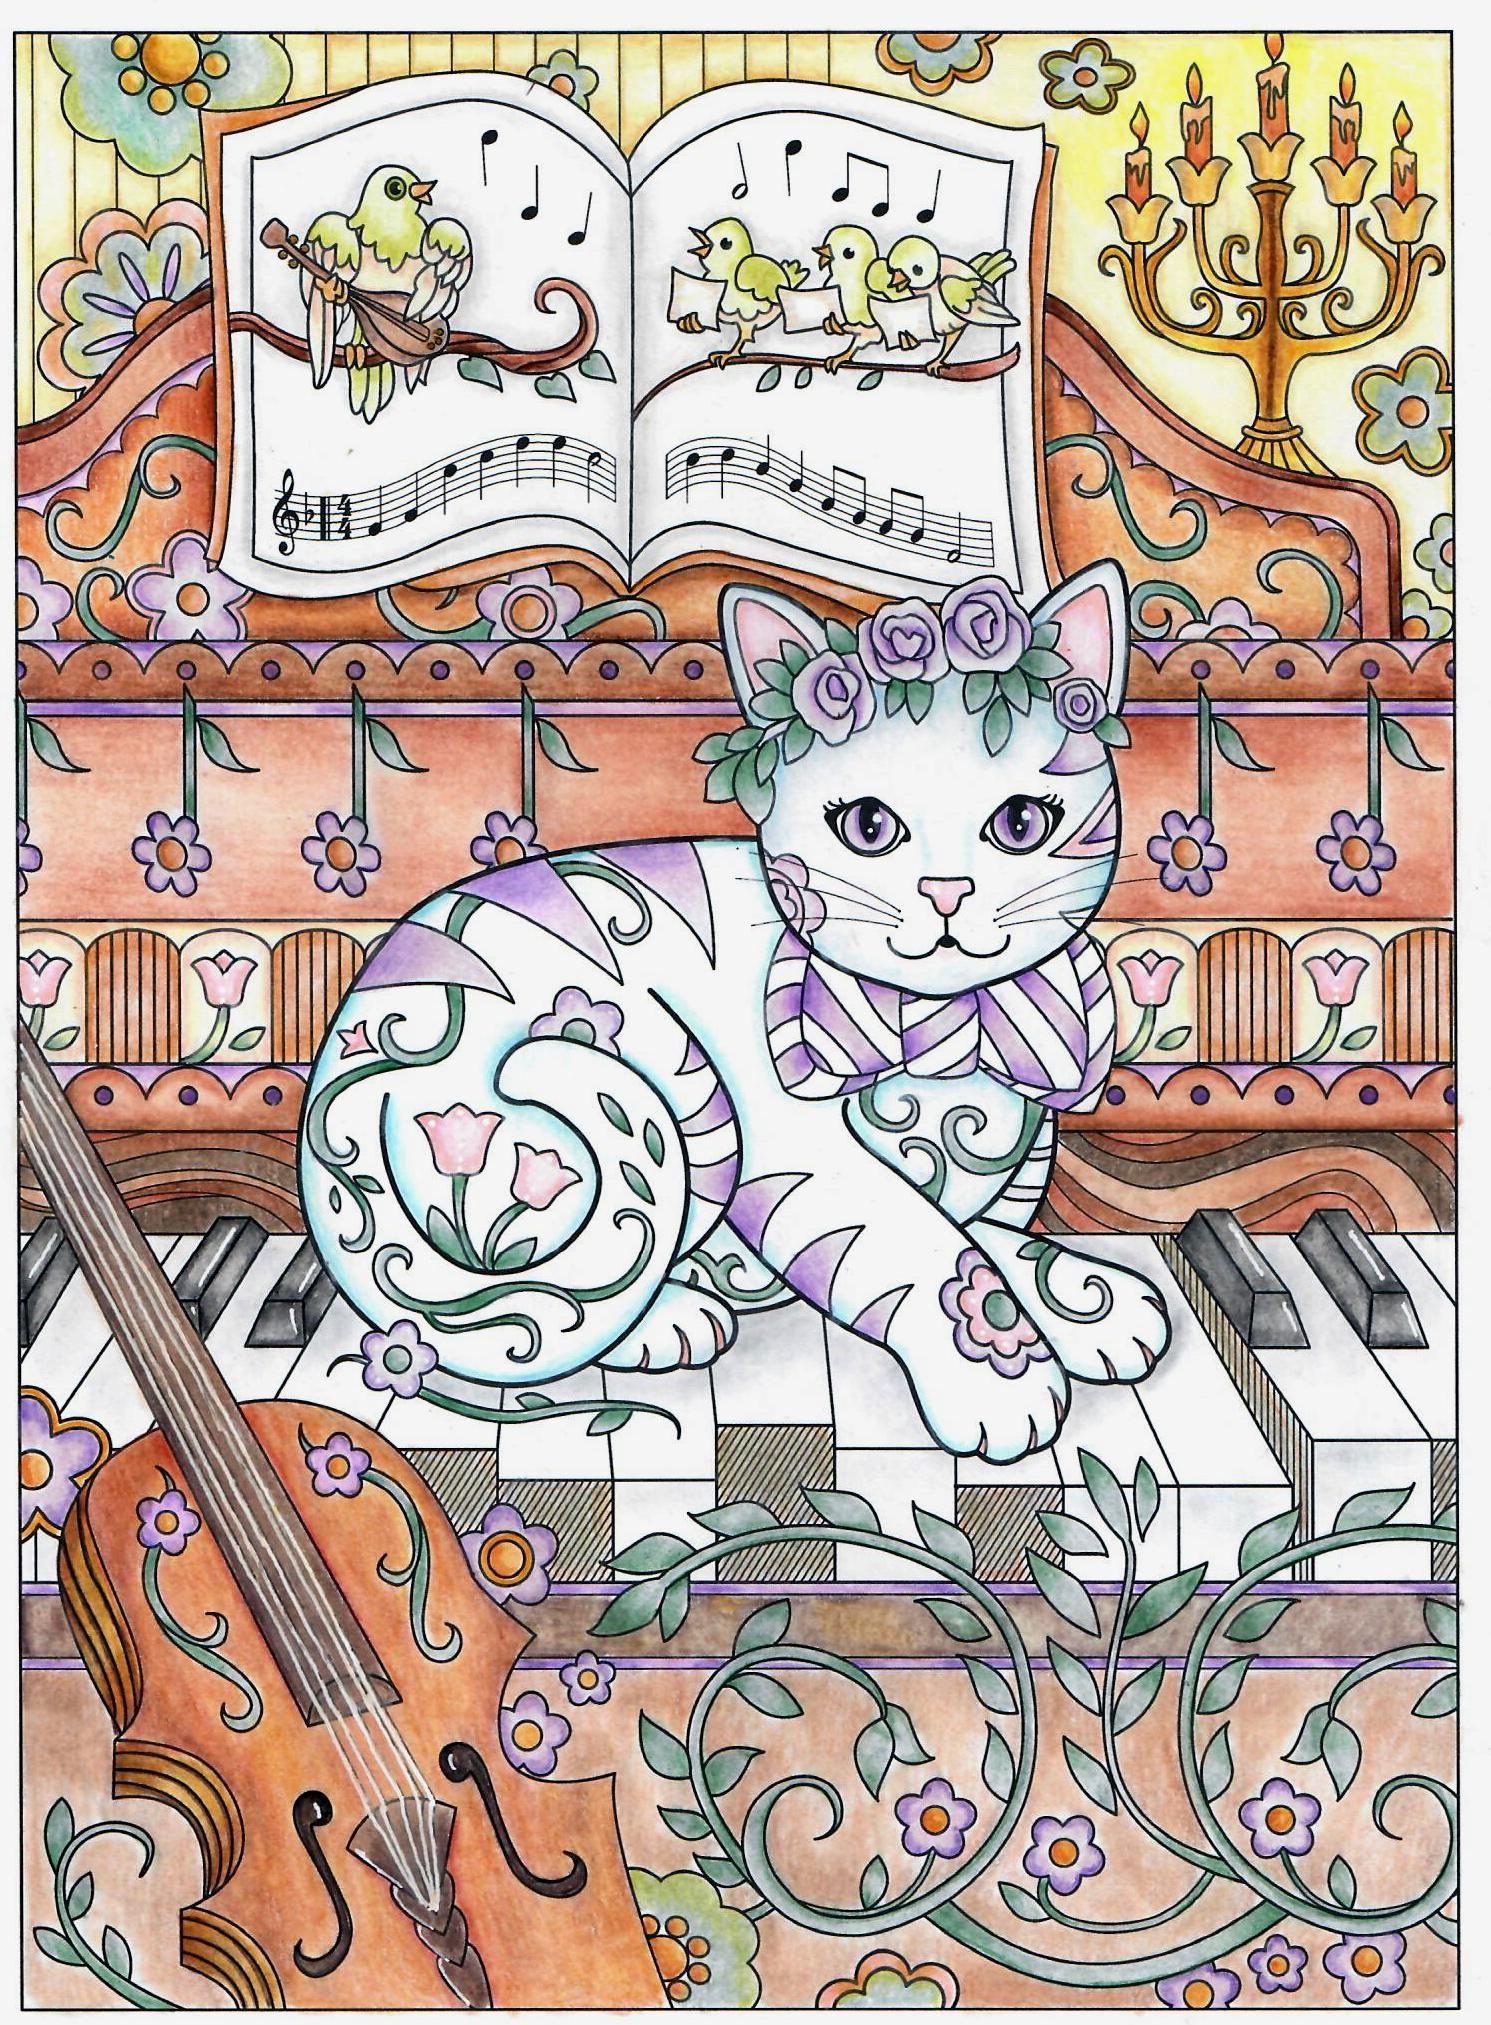 From marjorie sarnats book creative kittens kitty on piano cat art